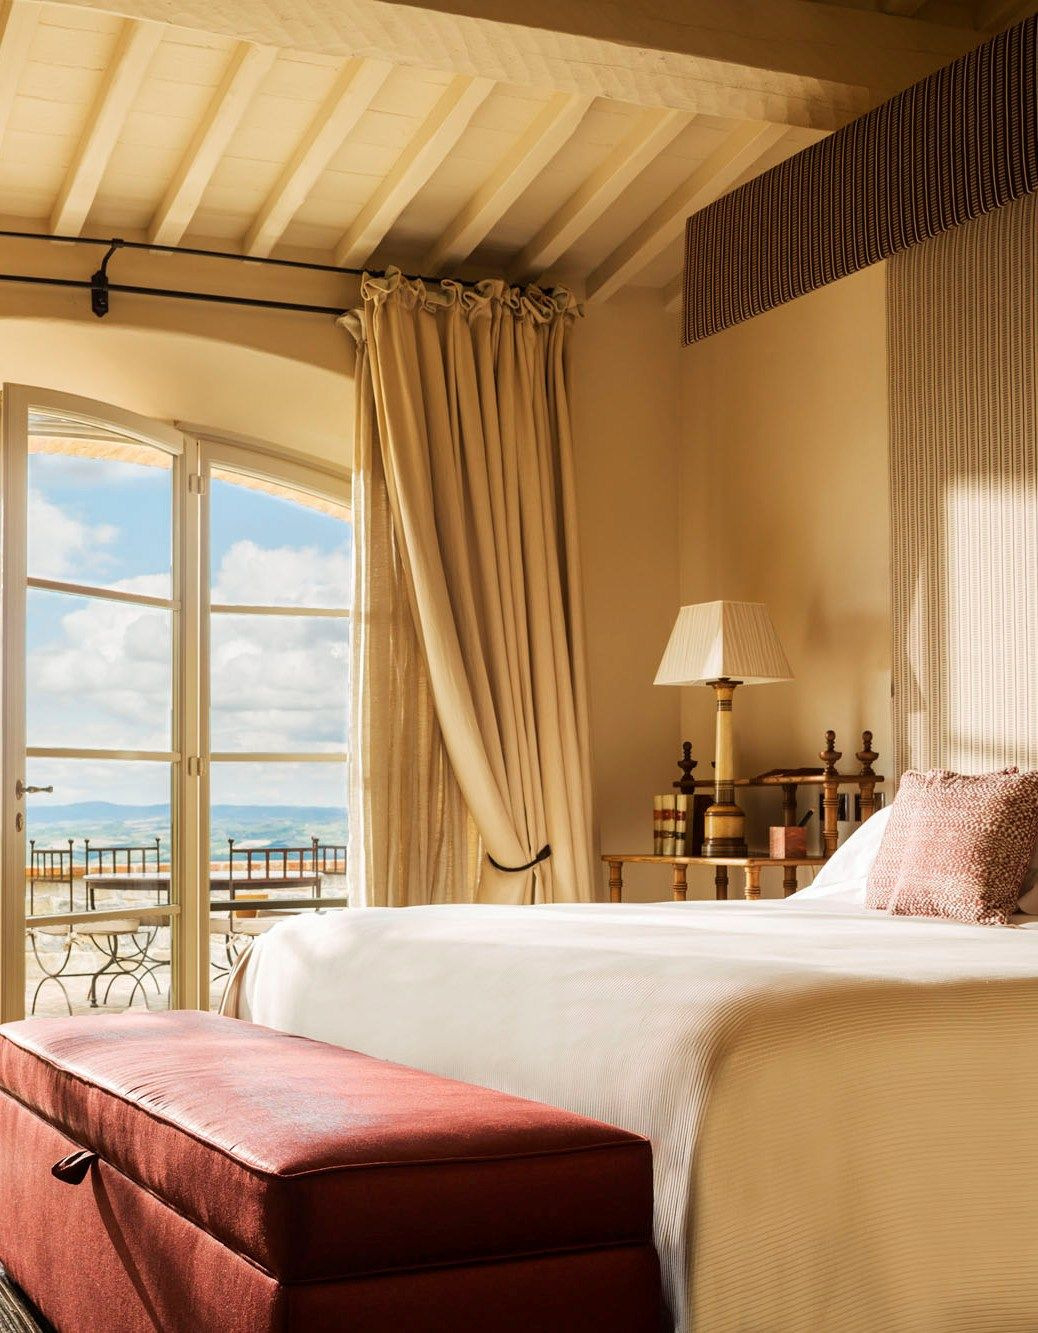 Best Villa Rental in Siena Siena Holiday Villa Rental